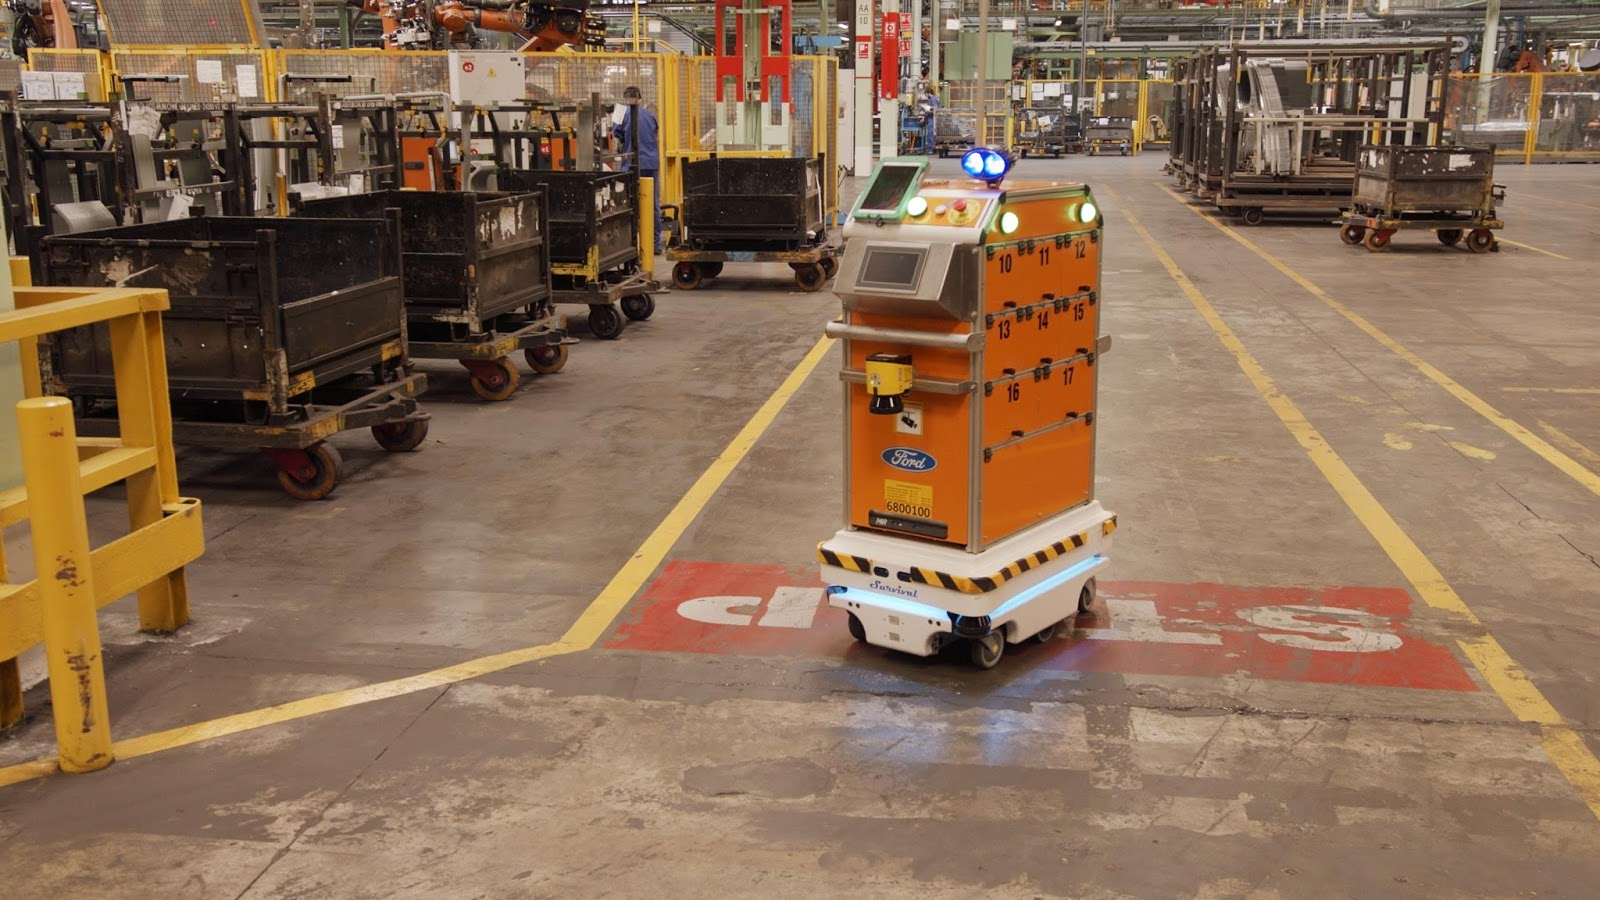 Ford SelfDrivingRobot 7 Η Ford έφτιαξε ένα ρομπότ για τις χαμαλοδουλειές του εργοστασίου της! Ford, video, videos, Εργοστάσιο, Τεχνολογία